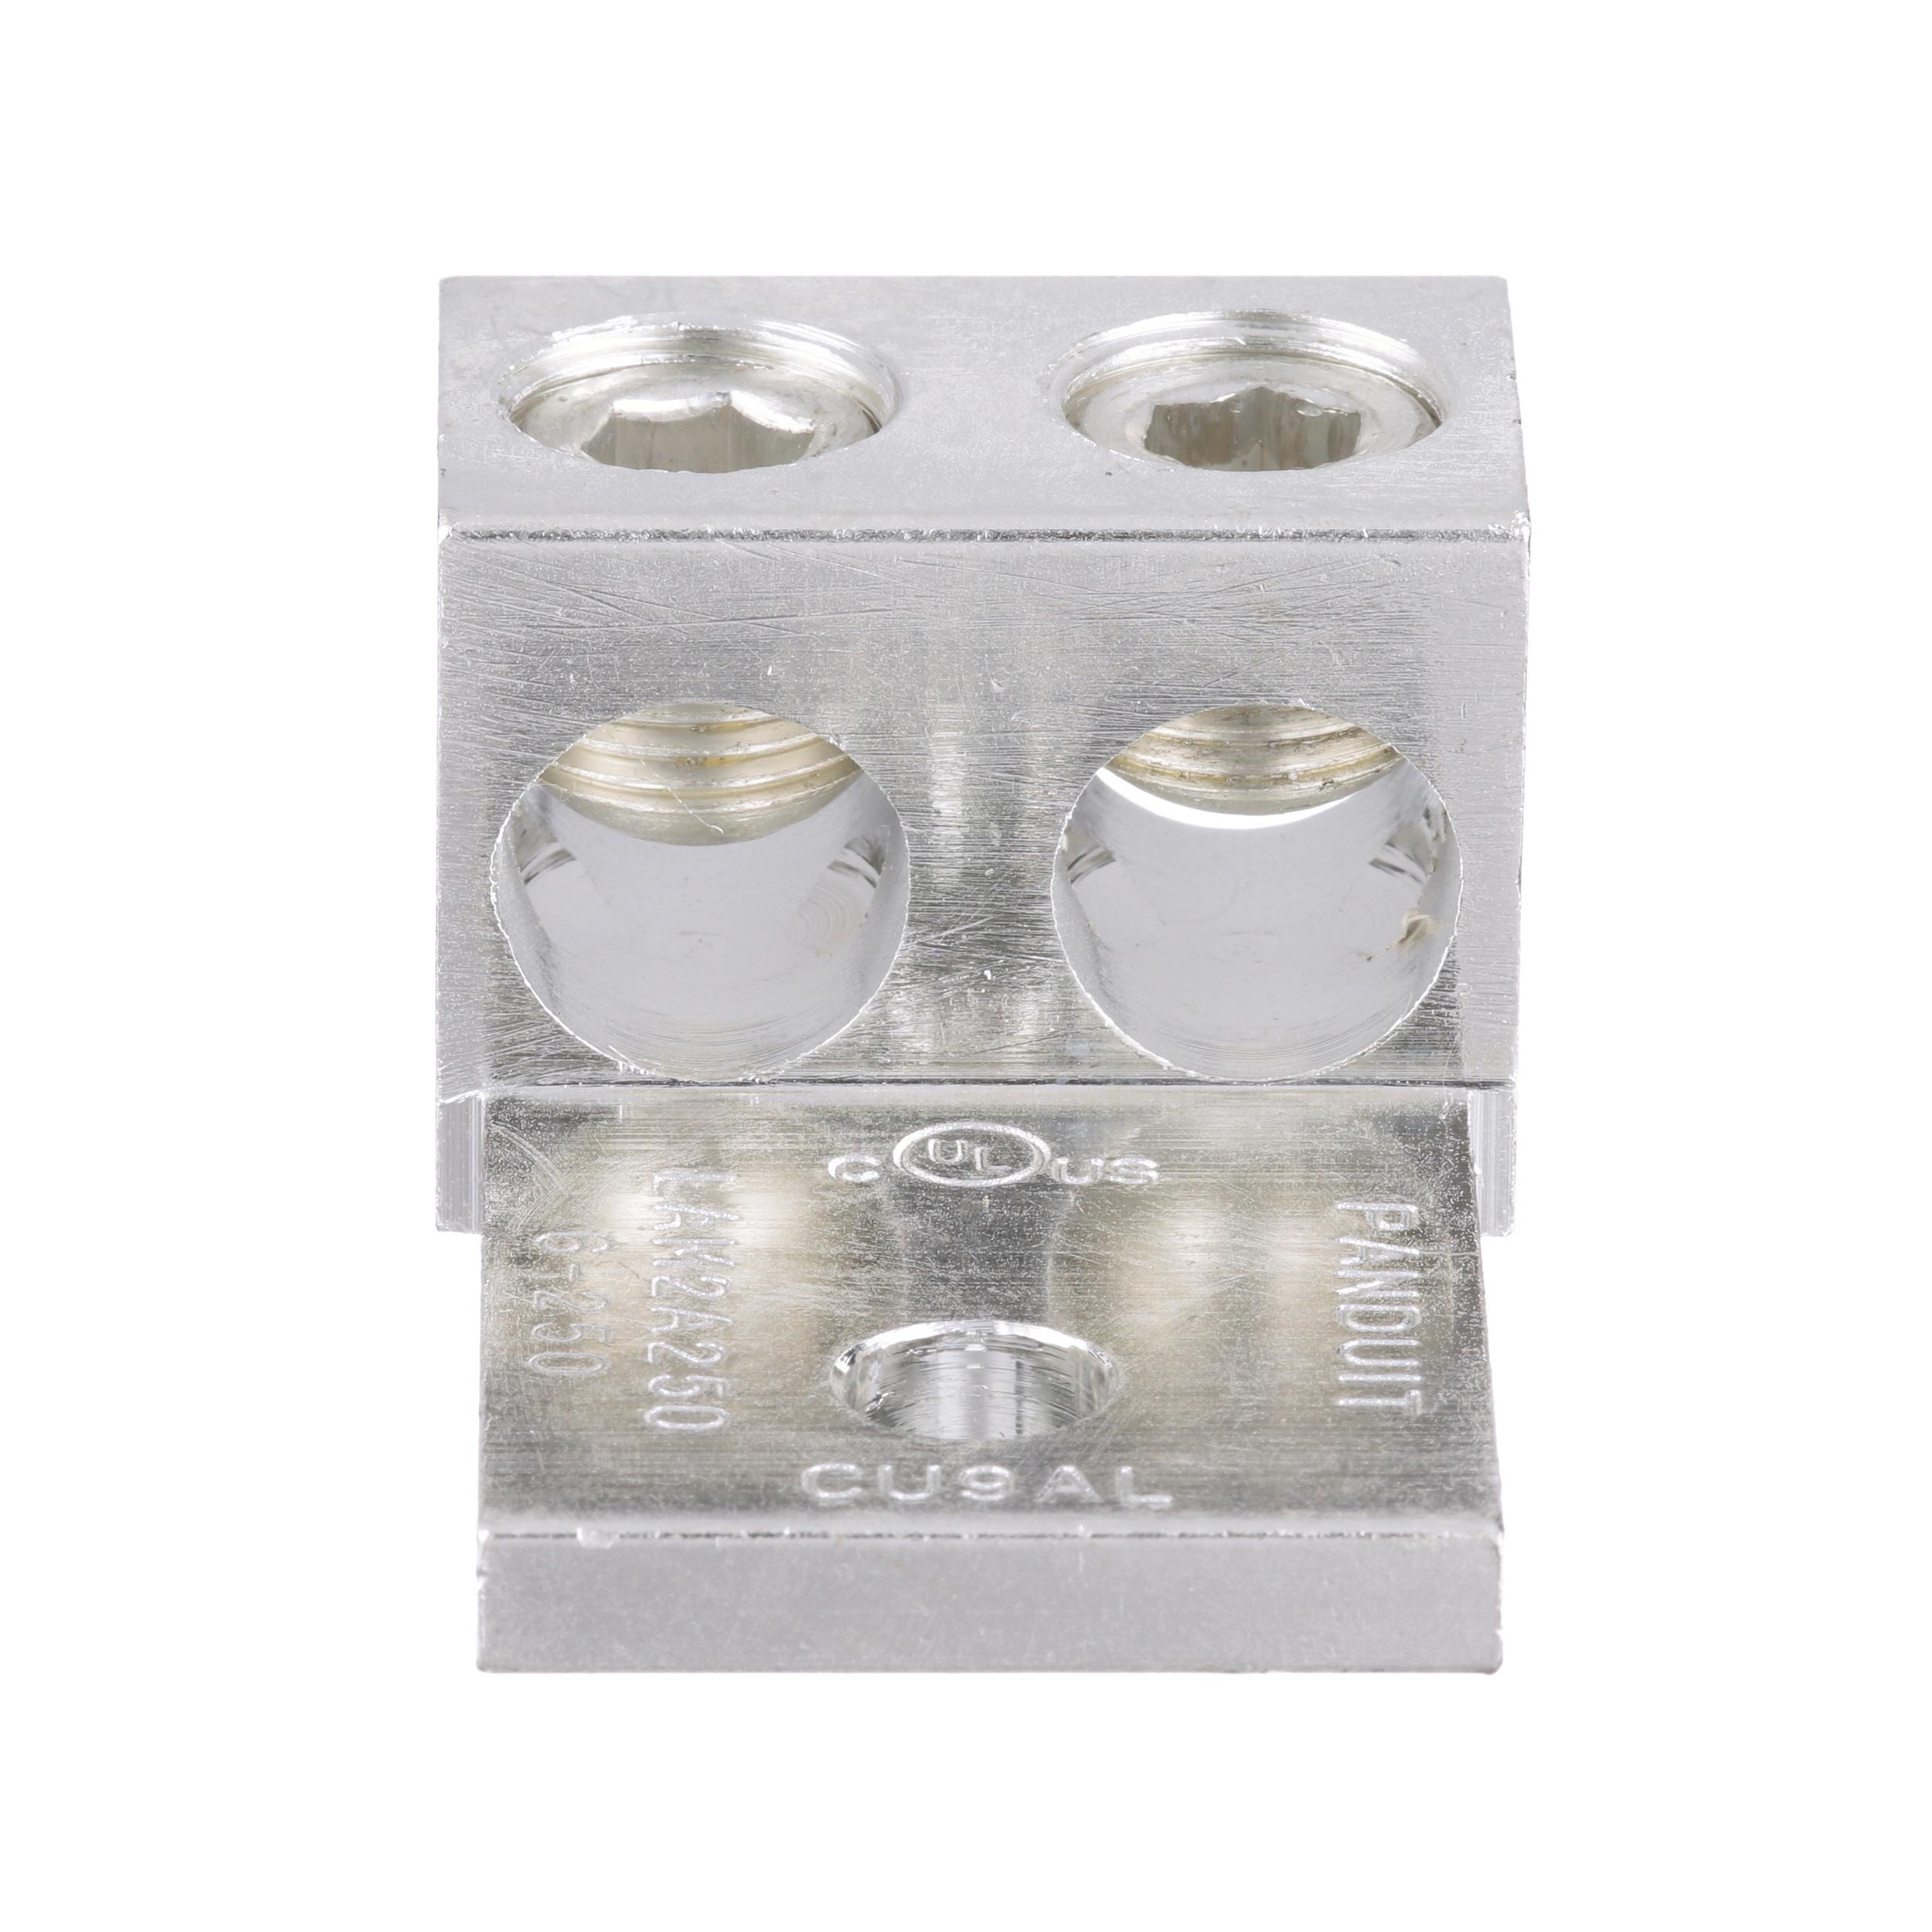 PAND LAM2A250-38-6Y AluminumMechanical Lug 1 Hole 2 Barre